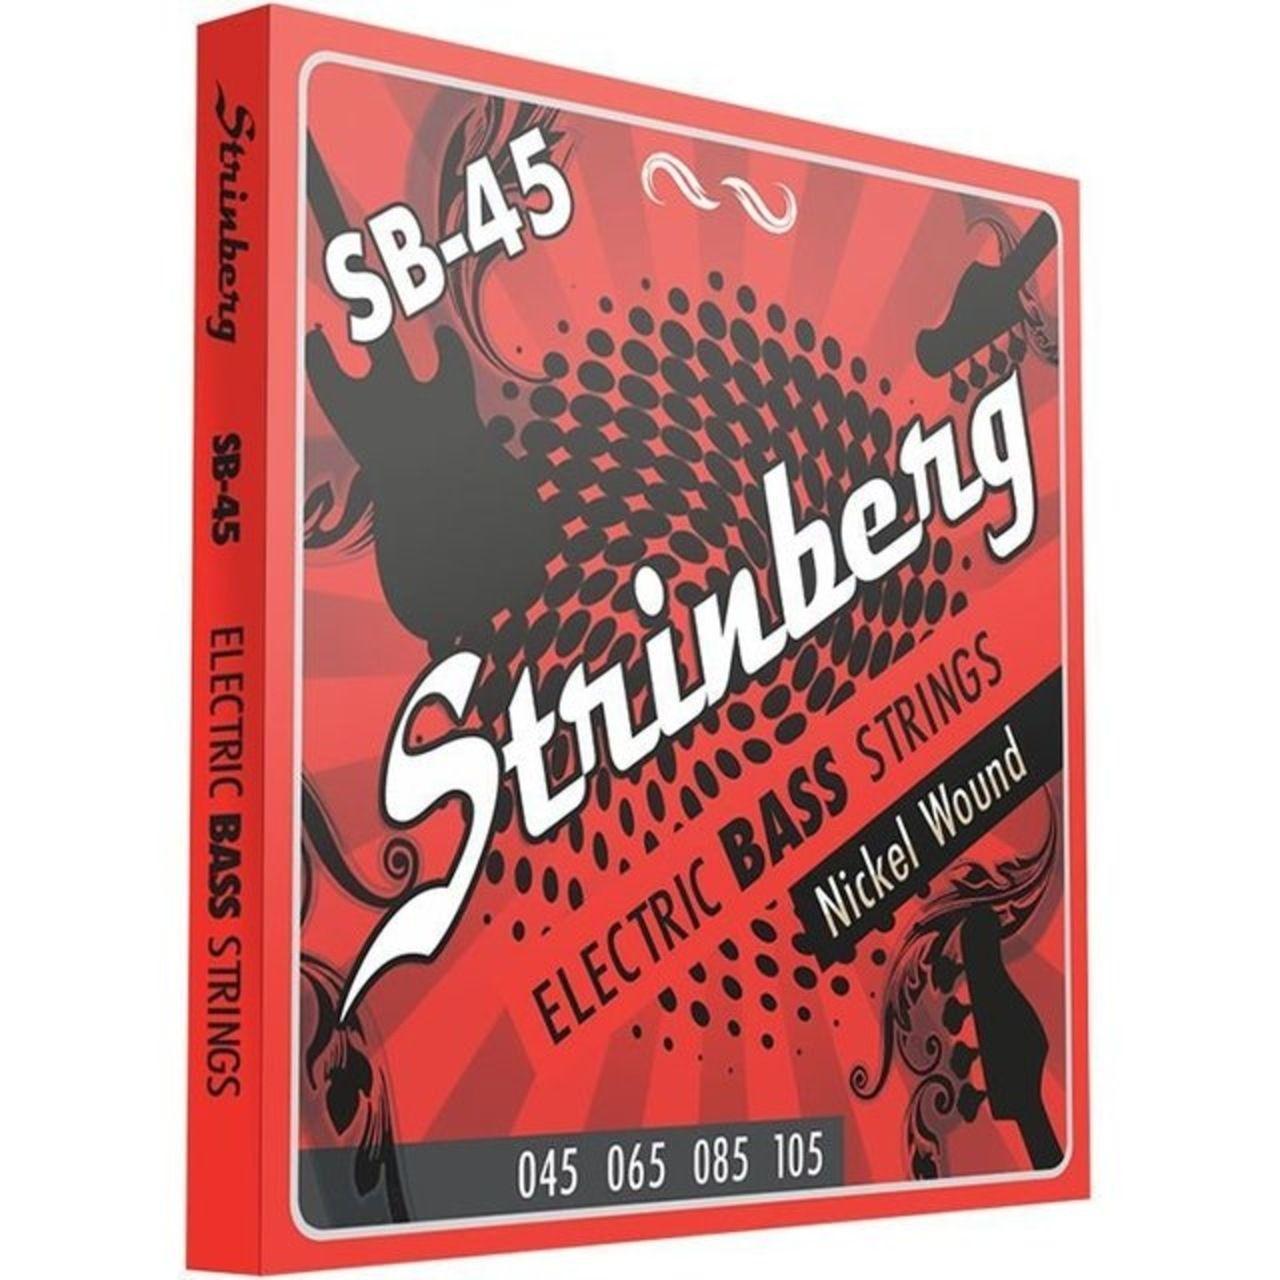 Encordoamento Strinberg 045 Sb45 Contrabaixo 4 Cordas